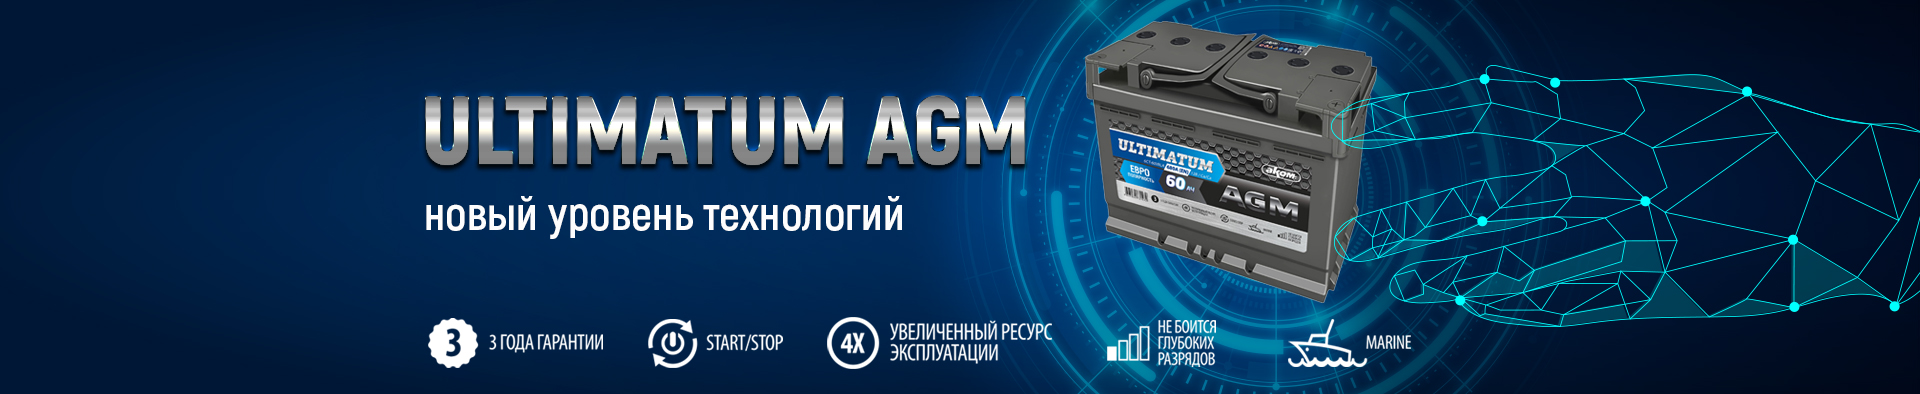 000_akom_Ultimatum_AGM